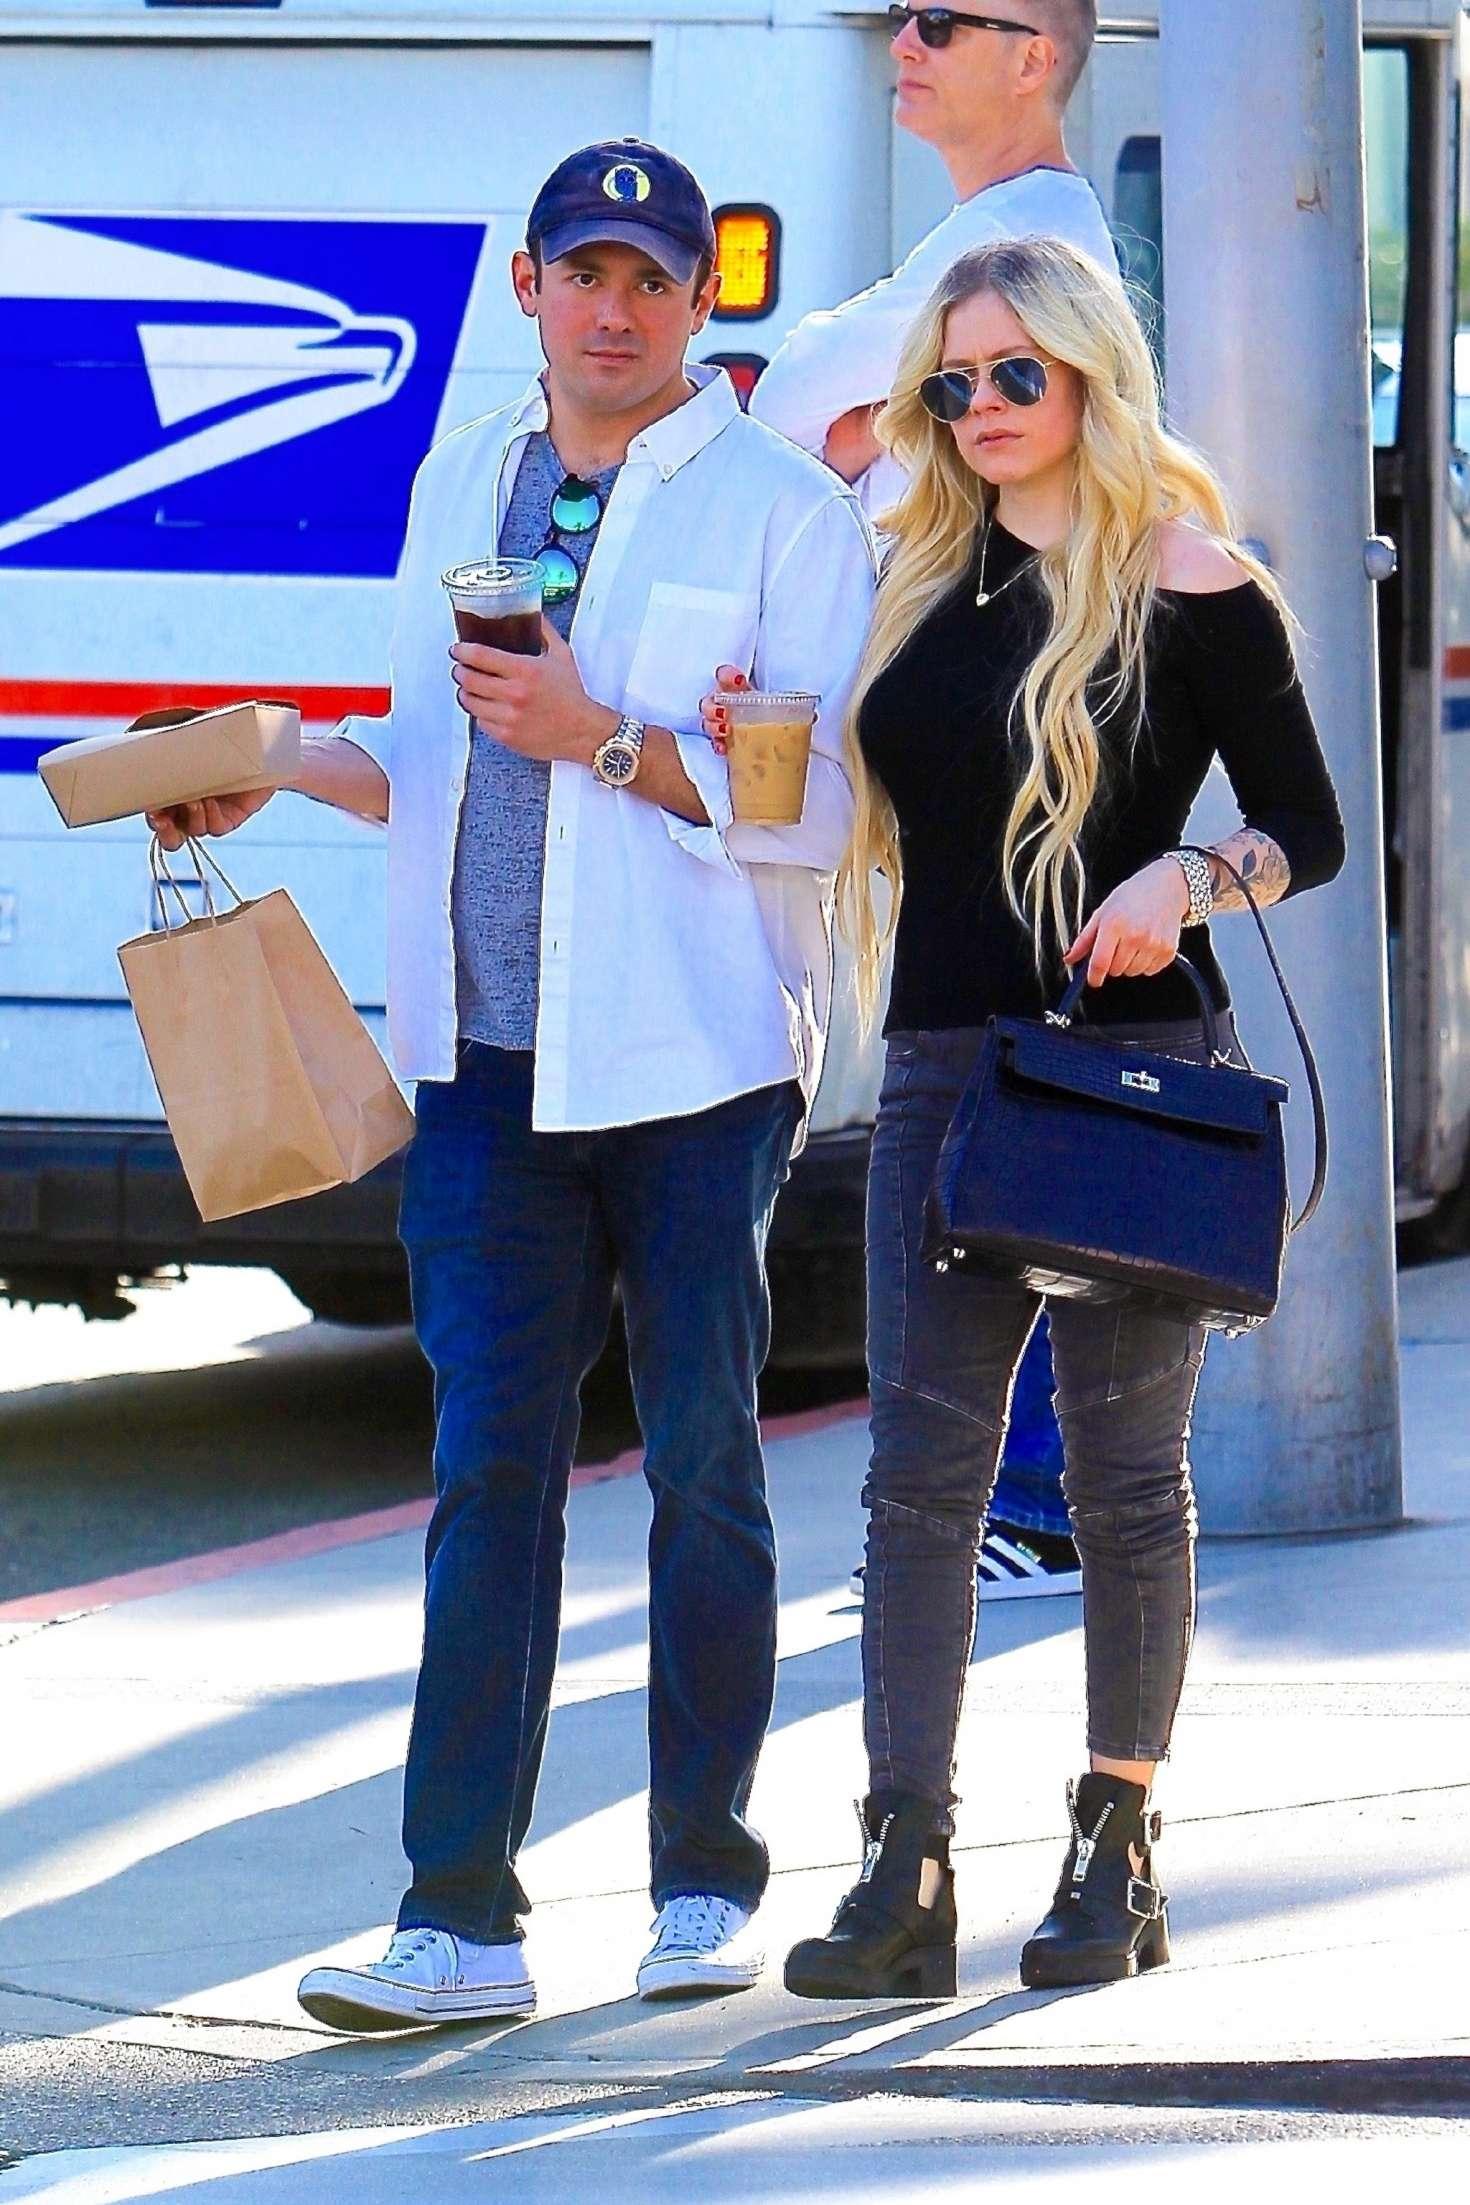 Avril Lavigne 2018 : Avril Lavigne and boyfriend Phillip Sarofim: Out in Beverly Hills -05